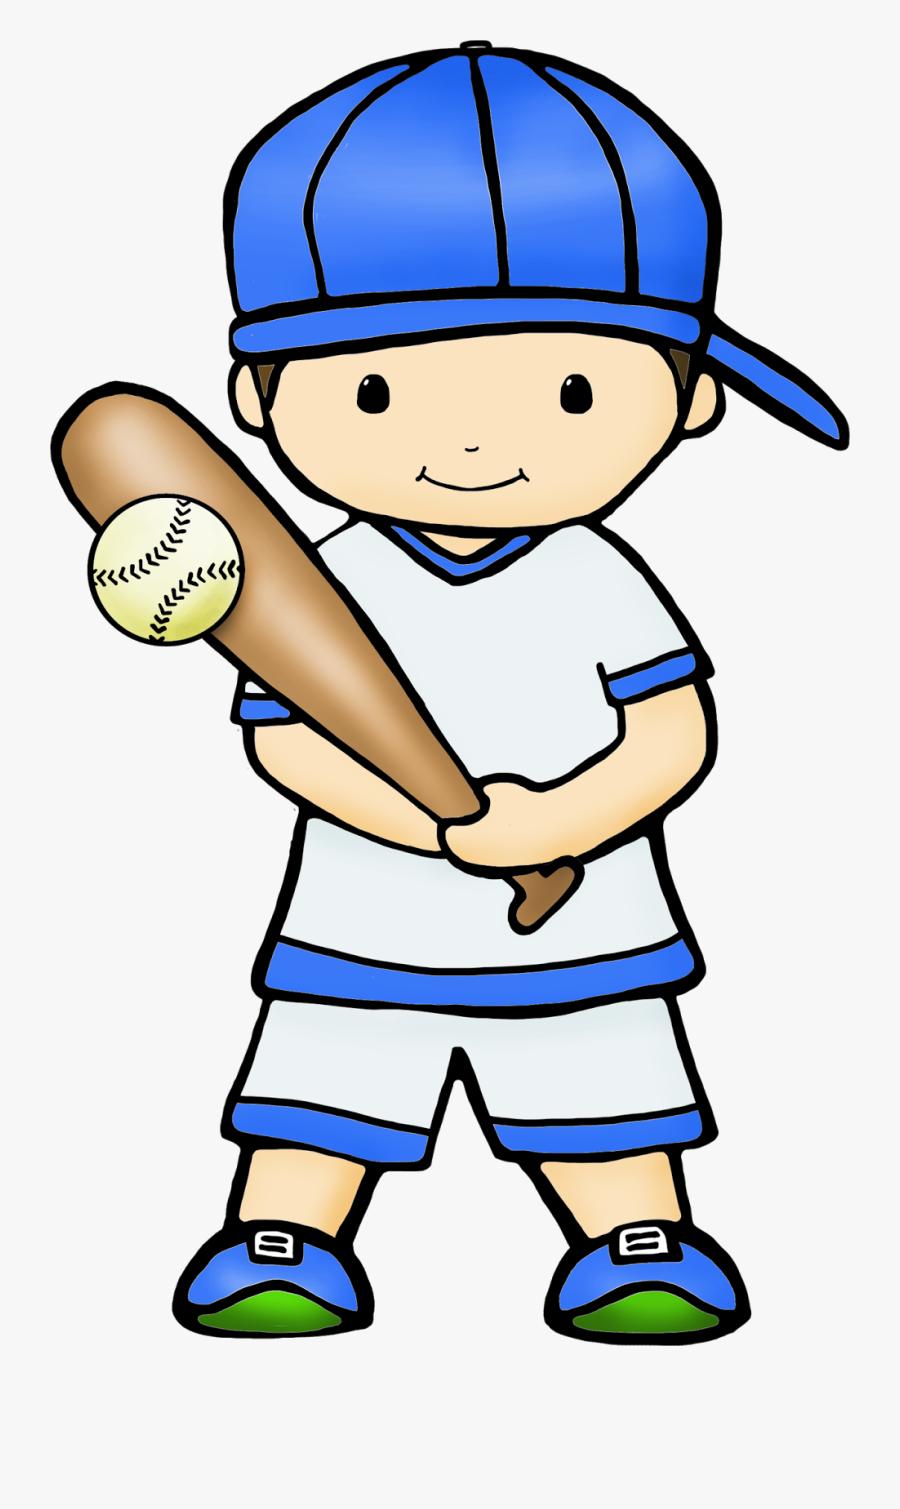 Slam Through The School Year With Fun Games That Teach - Boy Playing Baseball Cartoon, Transparent Clipart